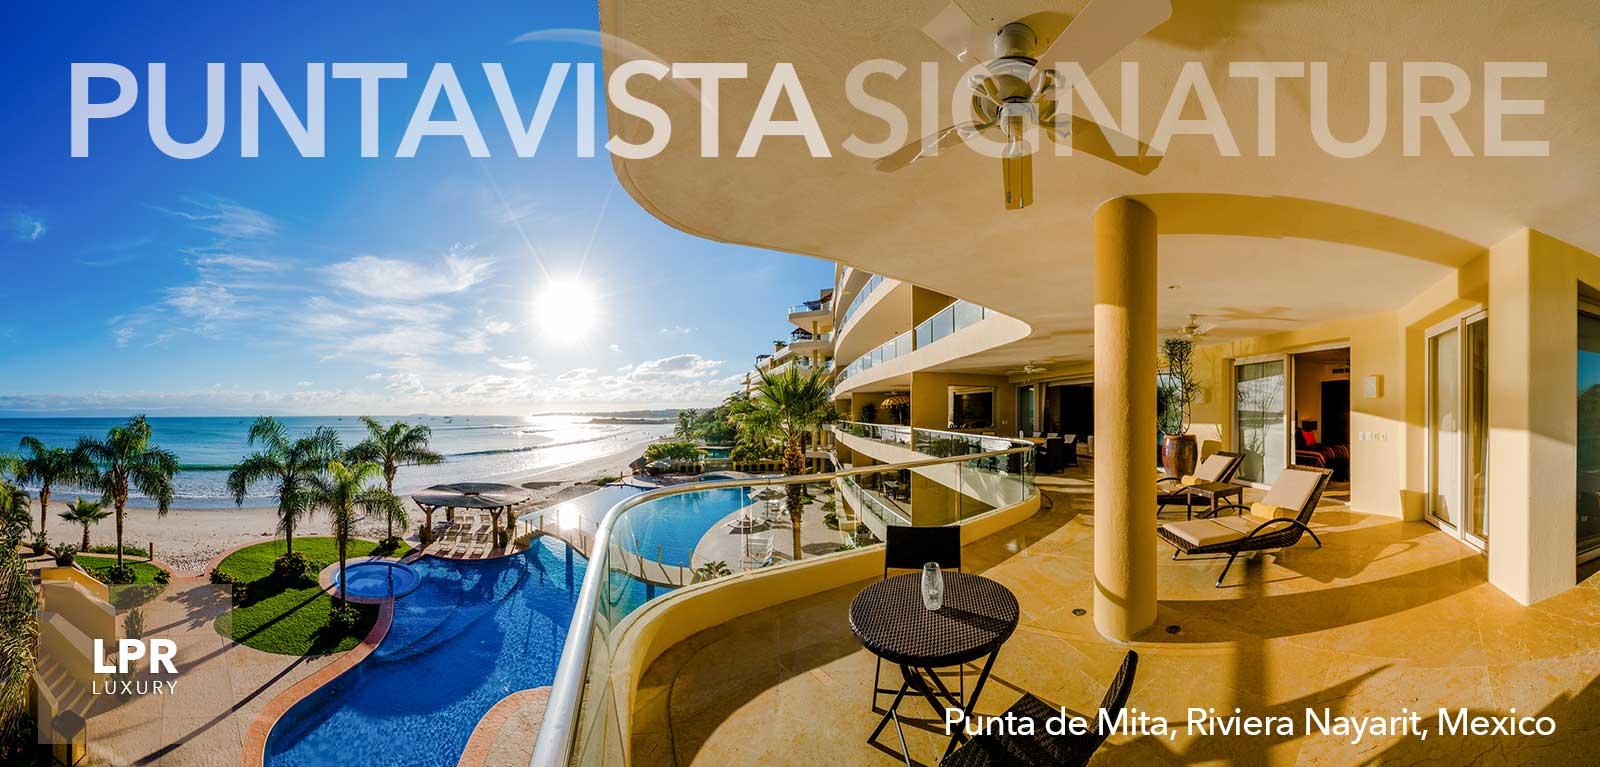 PVSR - Punta Vista Signature Residences luxury beachfront condos - Punta de Mita, Riviera Nayarit, Mexico